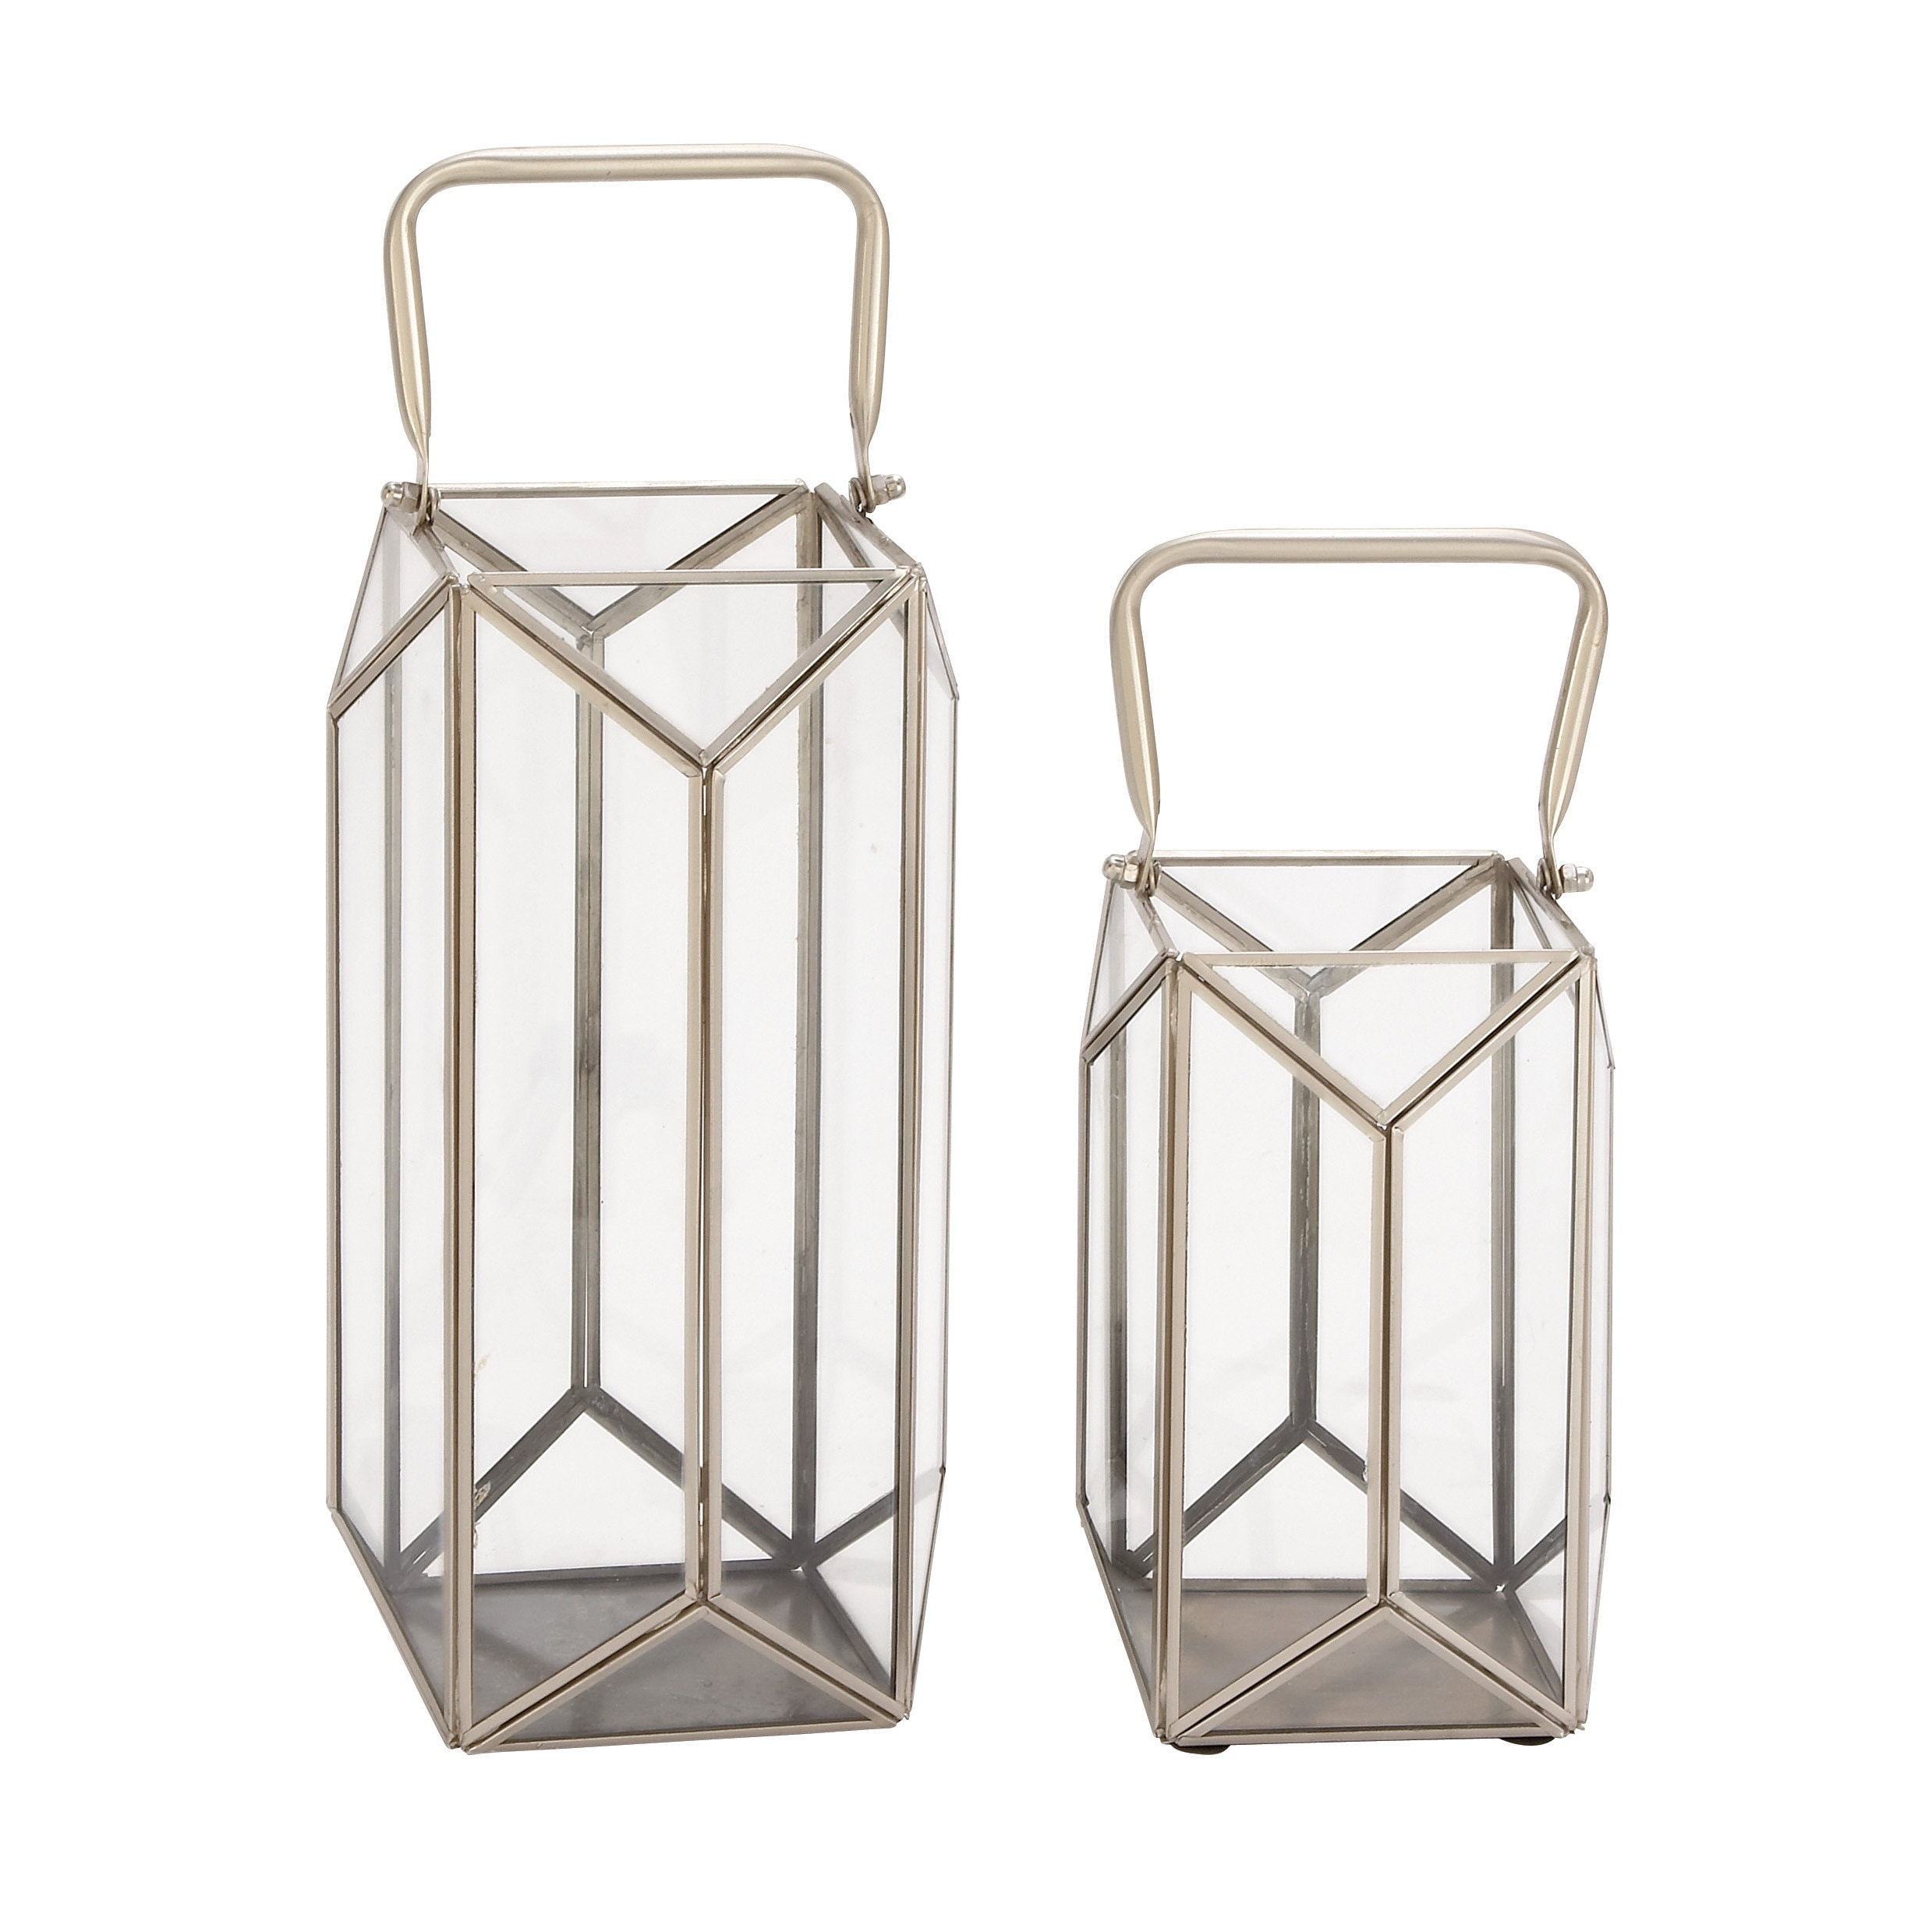 Studio 350 Metal and Glass Lantern (Set of 2) (Multi-Colo...